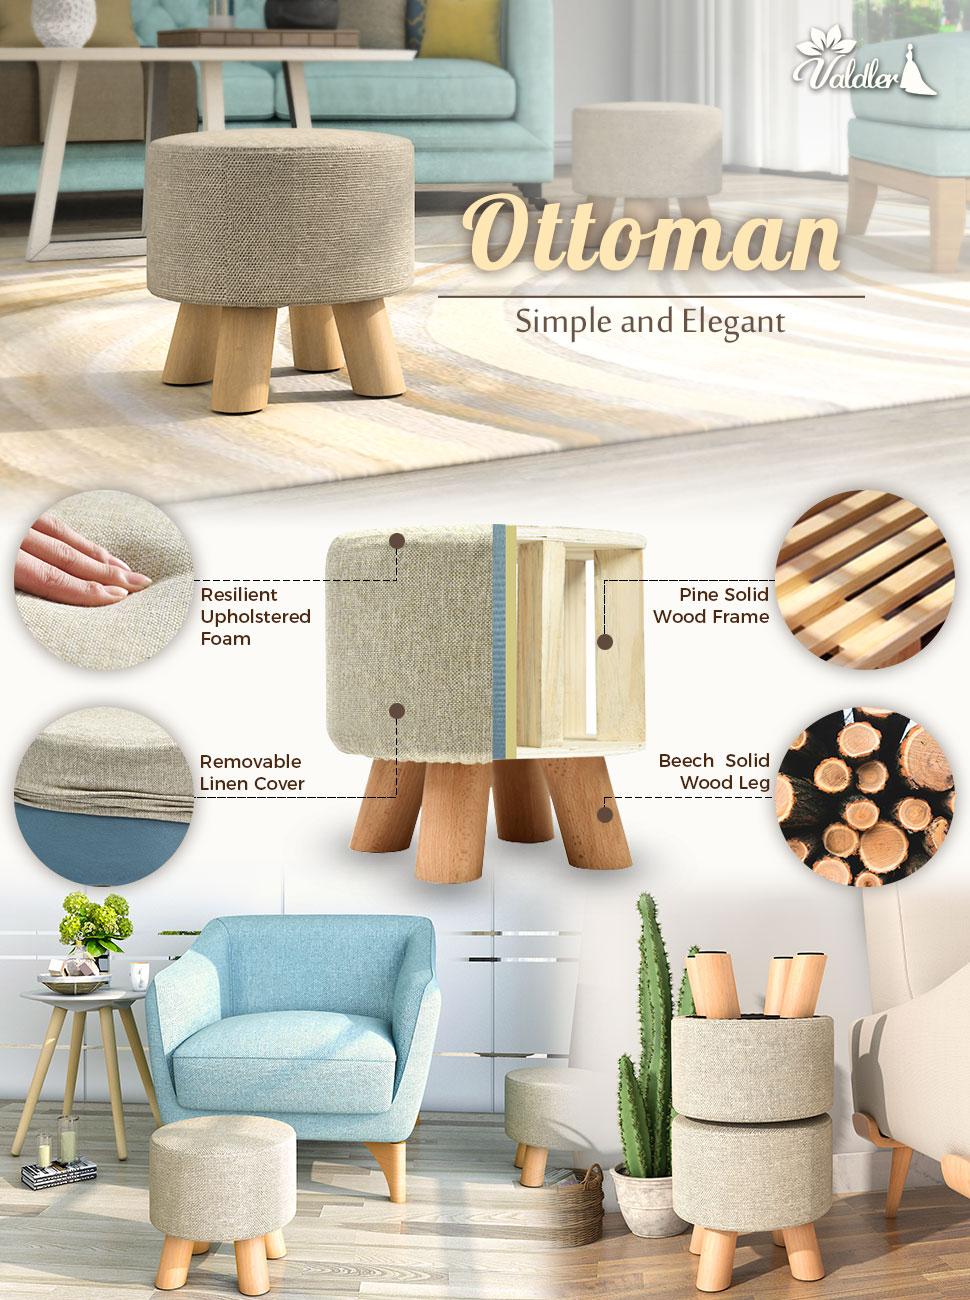 Amazon.com: Valdler Home Round Upholstered Ottoman Foot Stool in ...